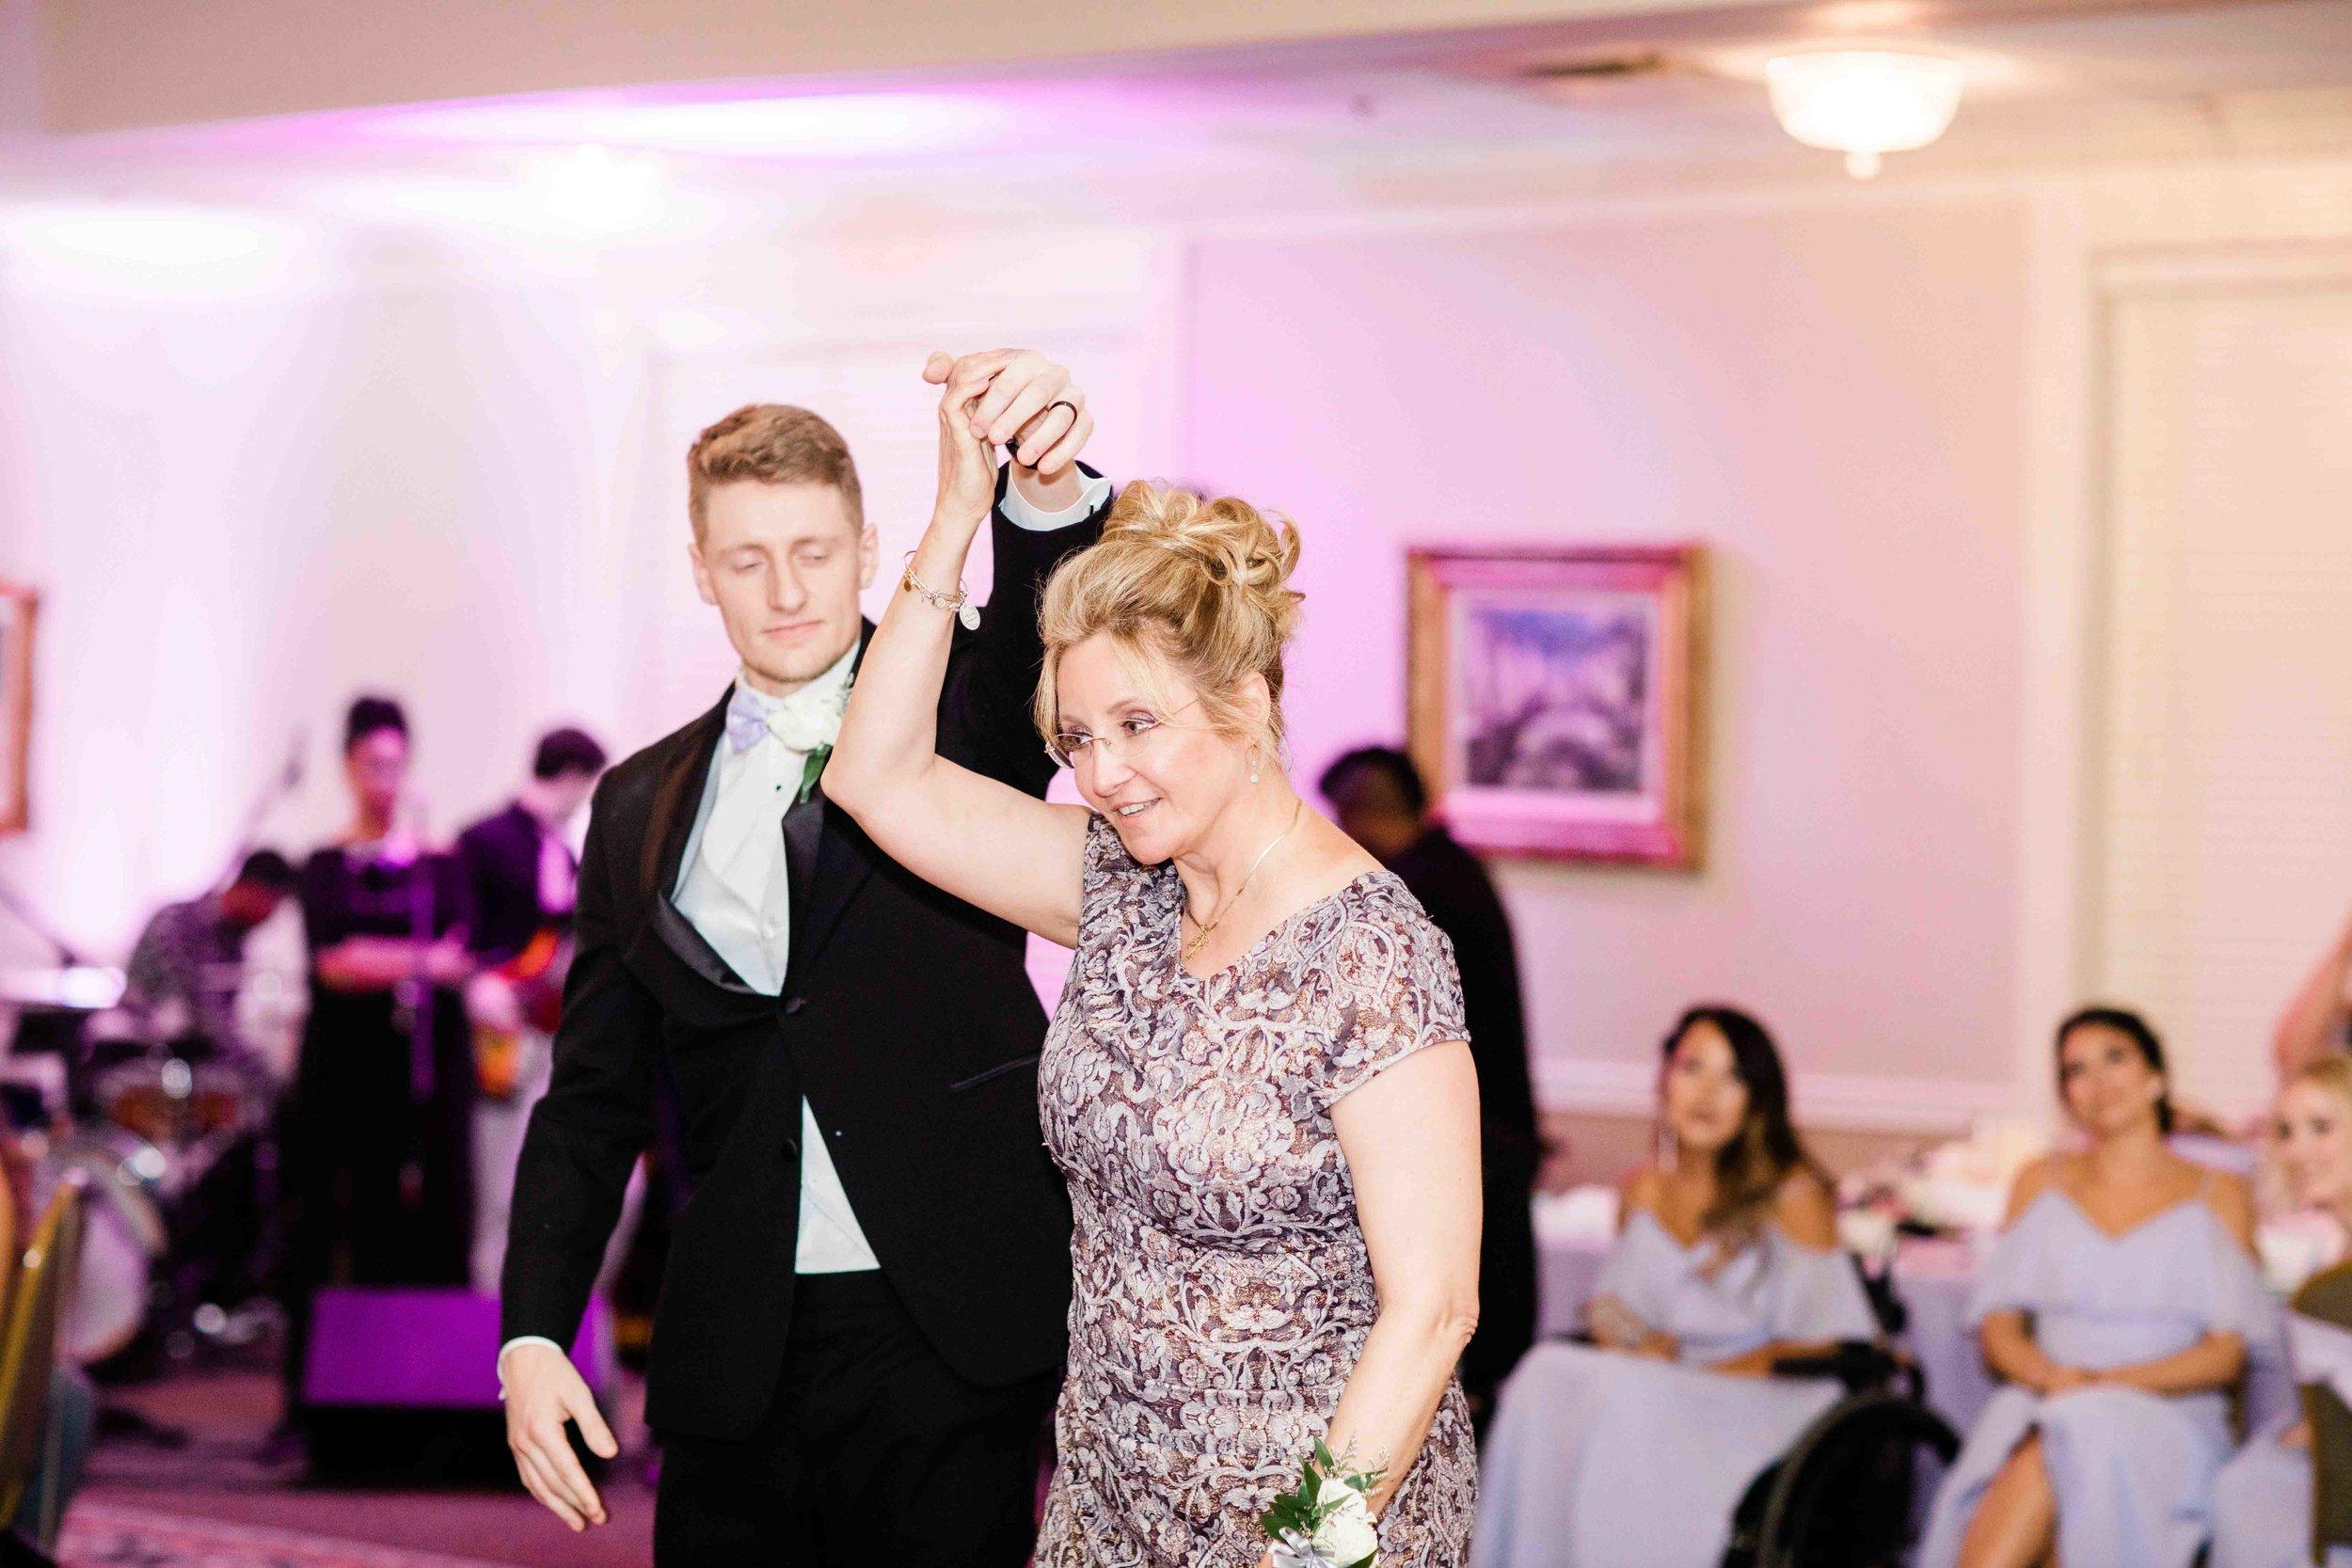 wedding reception photographers cincinnati dayton ohio-5.jpg